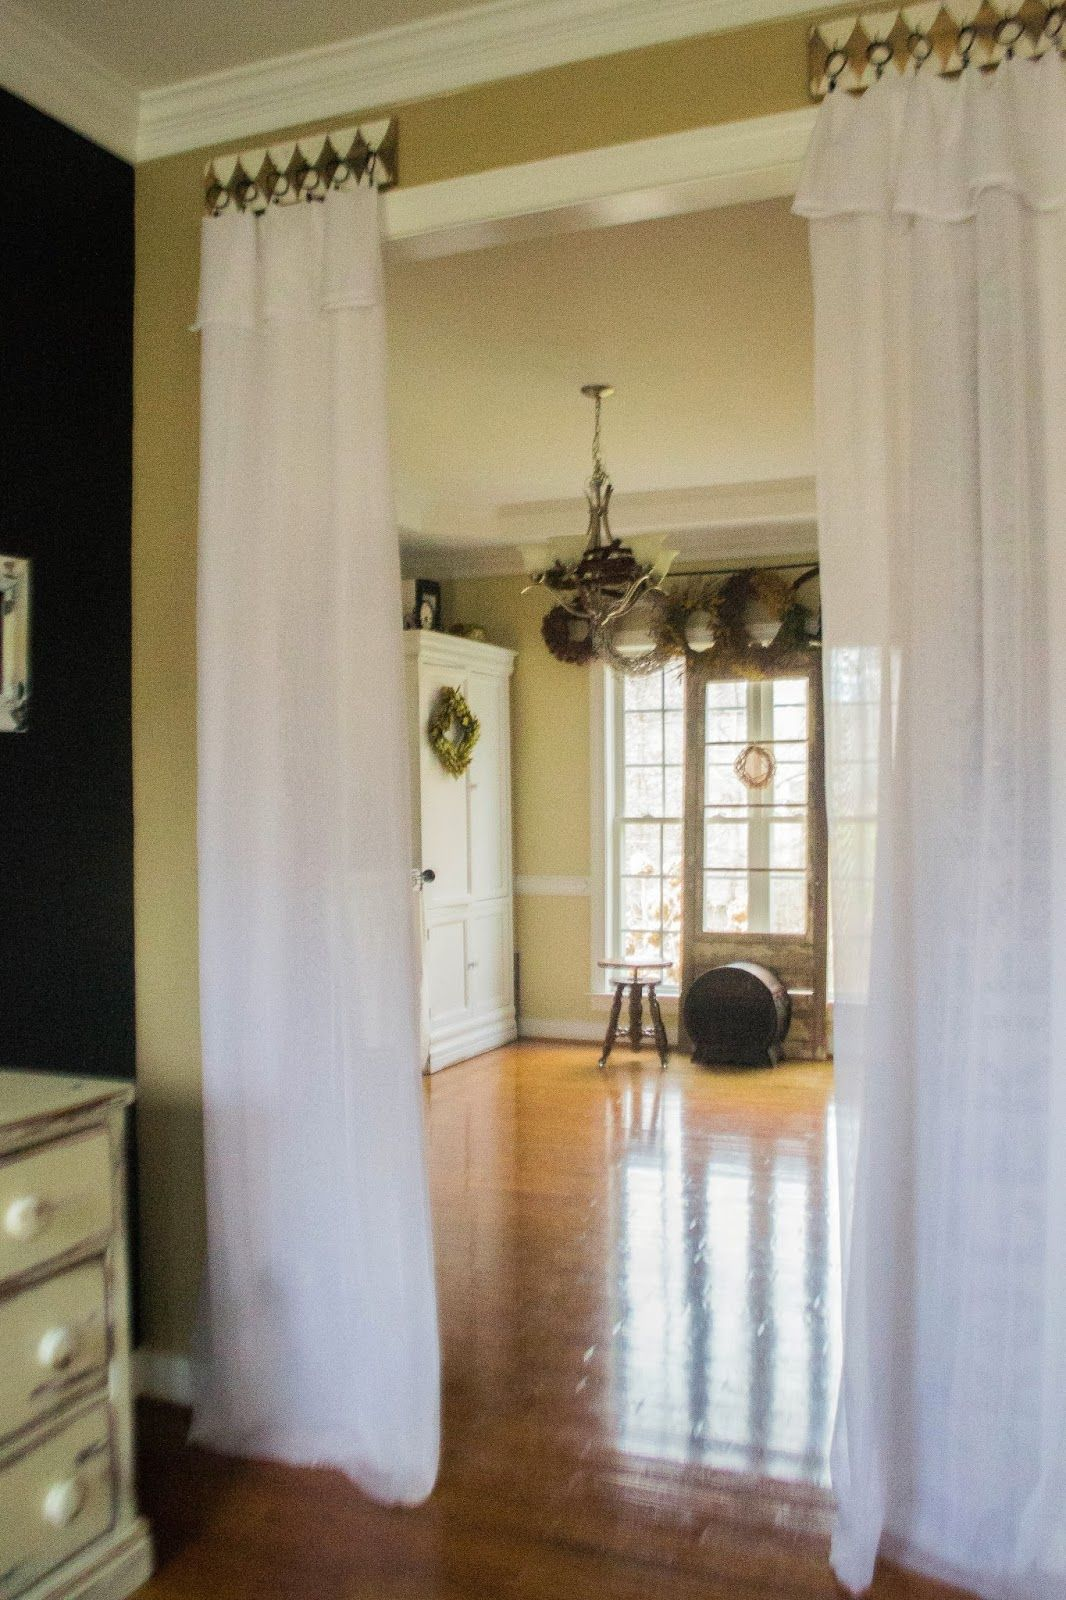 Make a Curtain Hook Board Diy curtain rods, Curtains